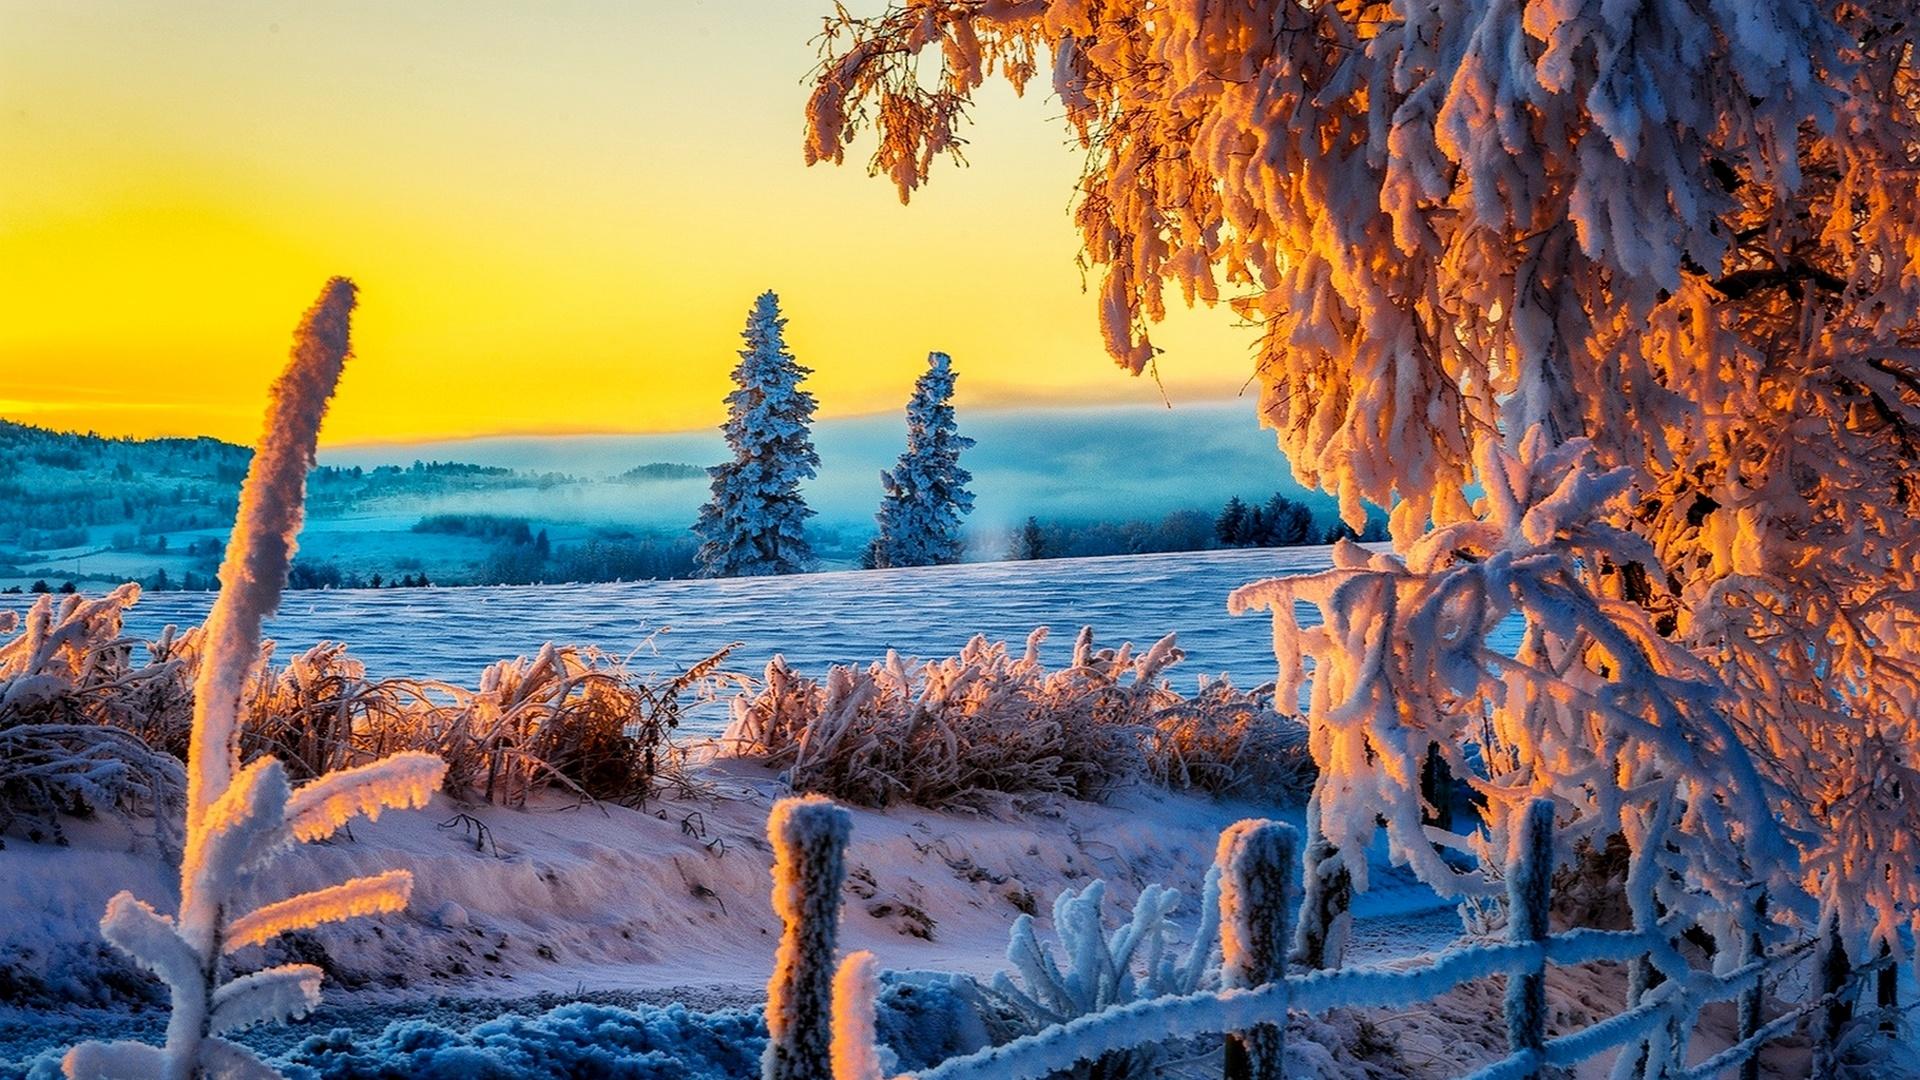 Beautiful Winter Sunrise 4K Ultra HD wallpaper 4k WallpaperNet 1920x1080